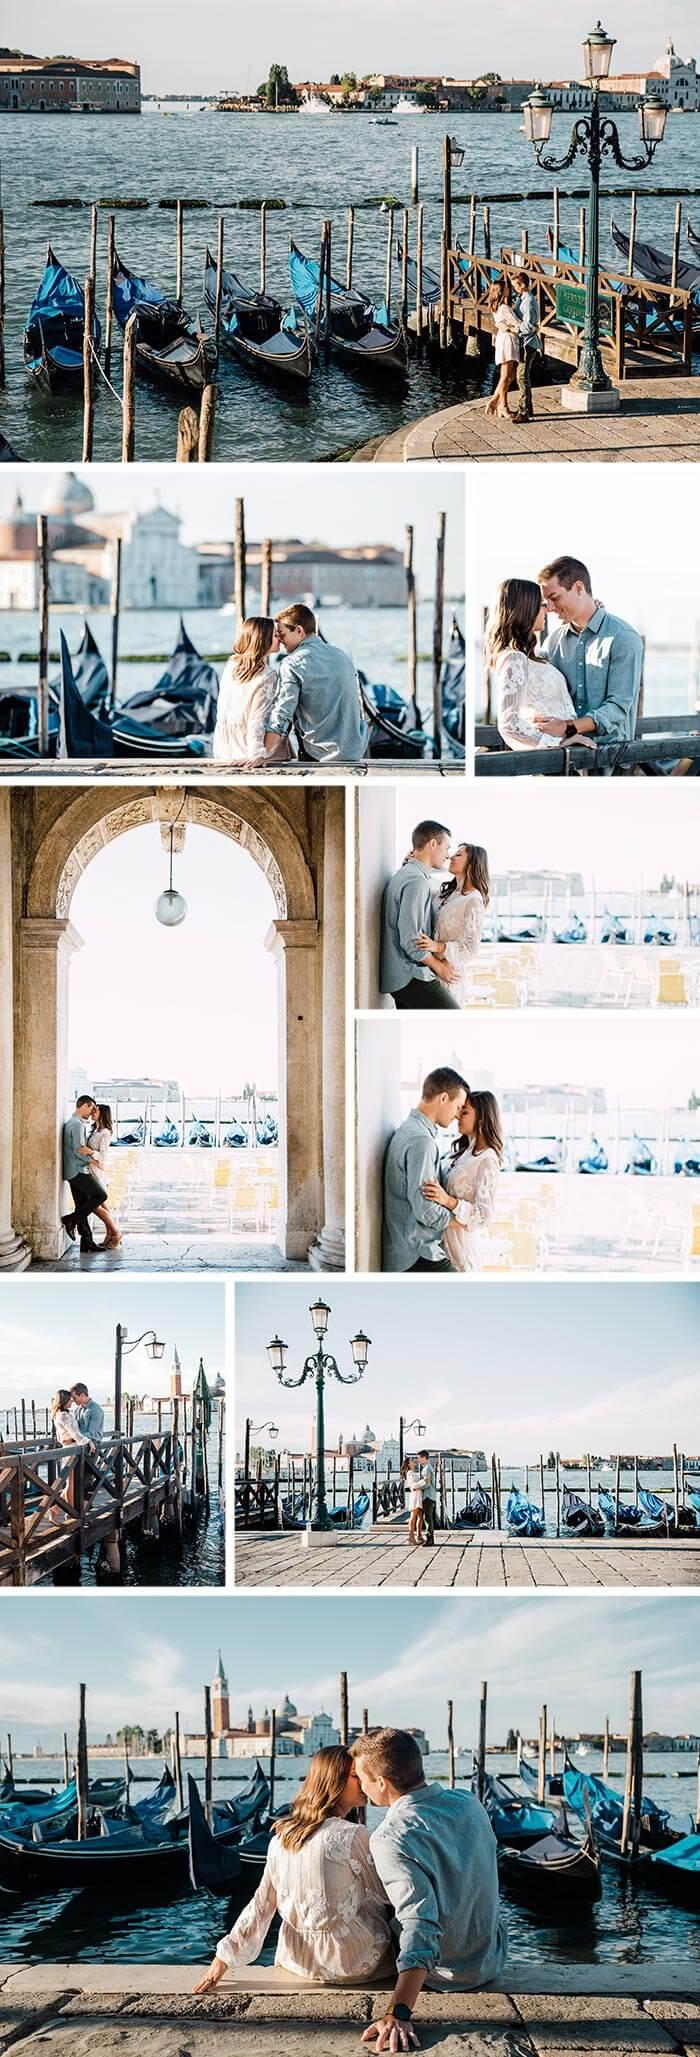 Verlobung Fotos